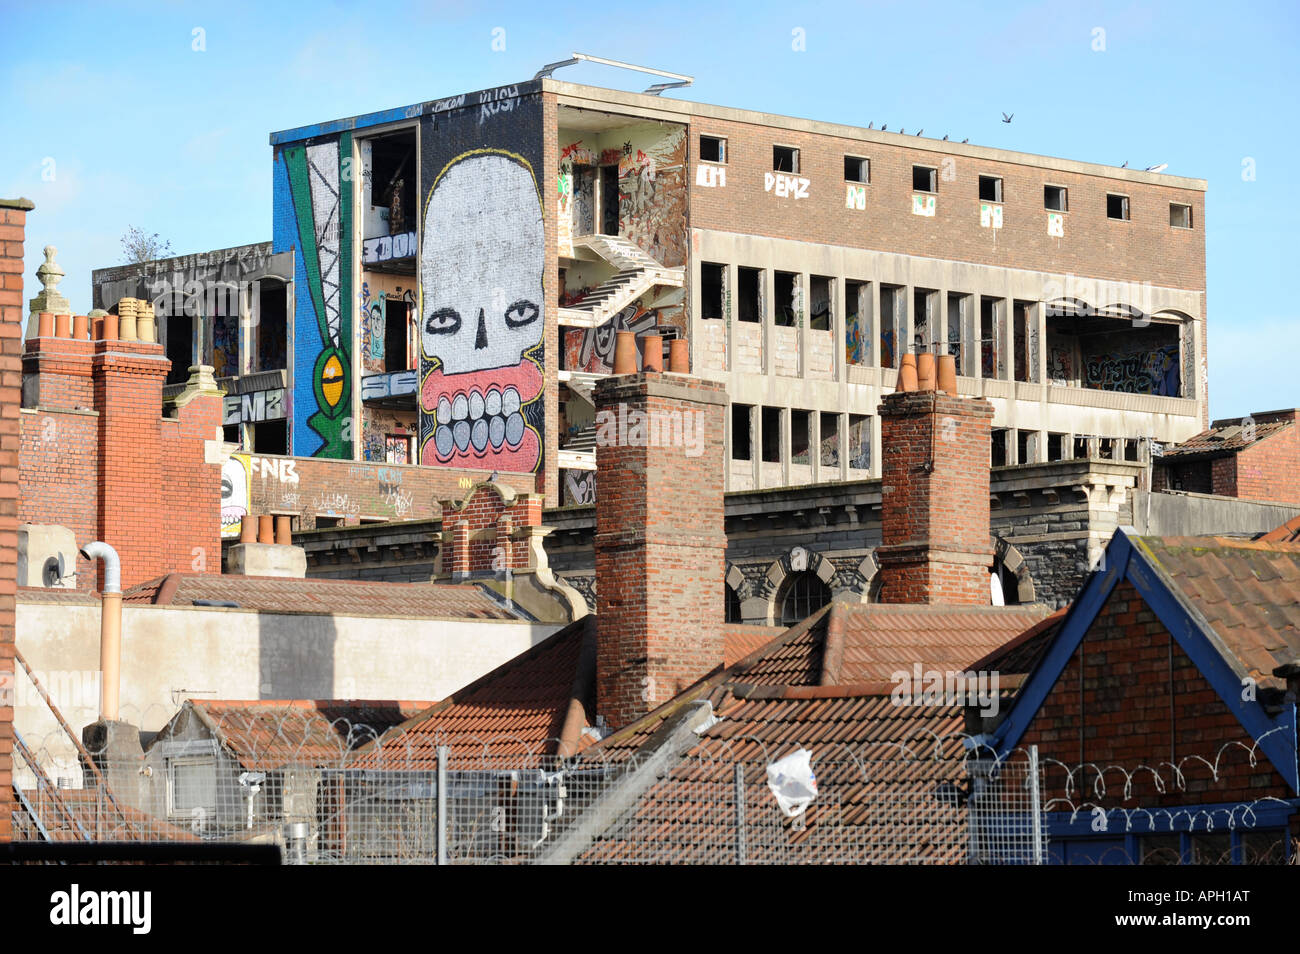 GRAFFITI WORK IN STOKES CROFT BRISTOL - Stock Image